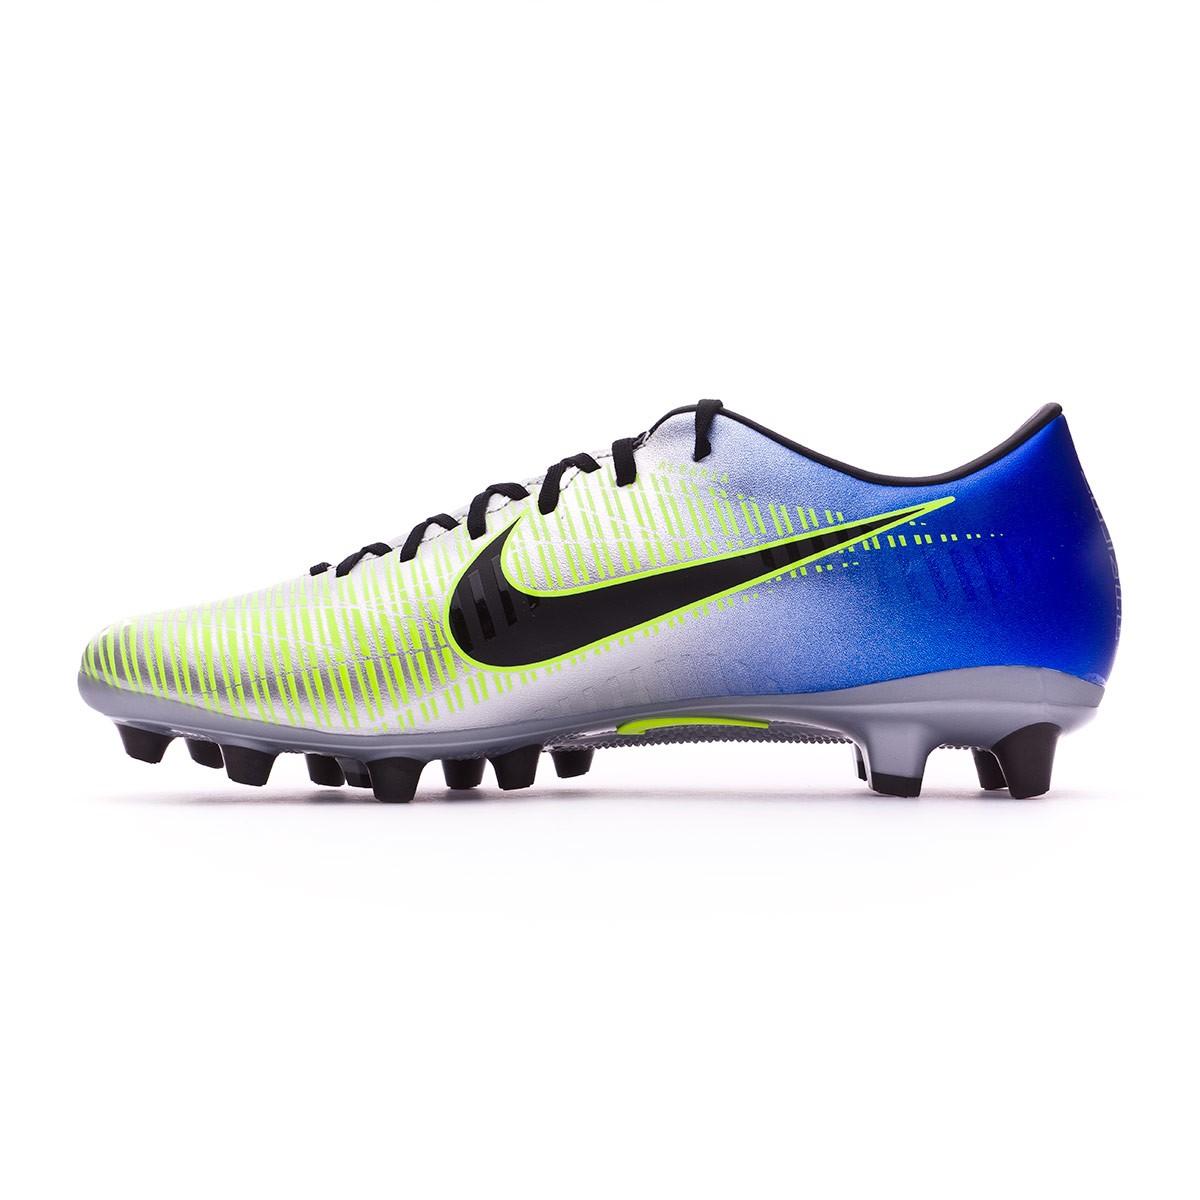 Zapatos de fútbol Nike Mercurial Victory VI AG Neymar Racer blue ... 1ce1740b9d